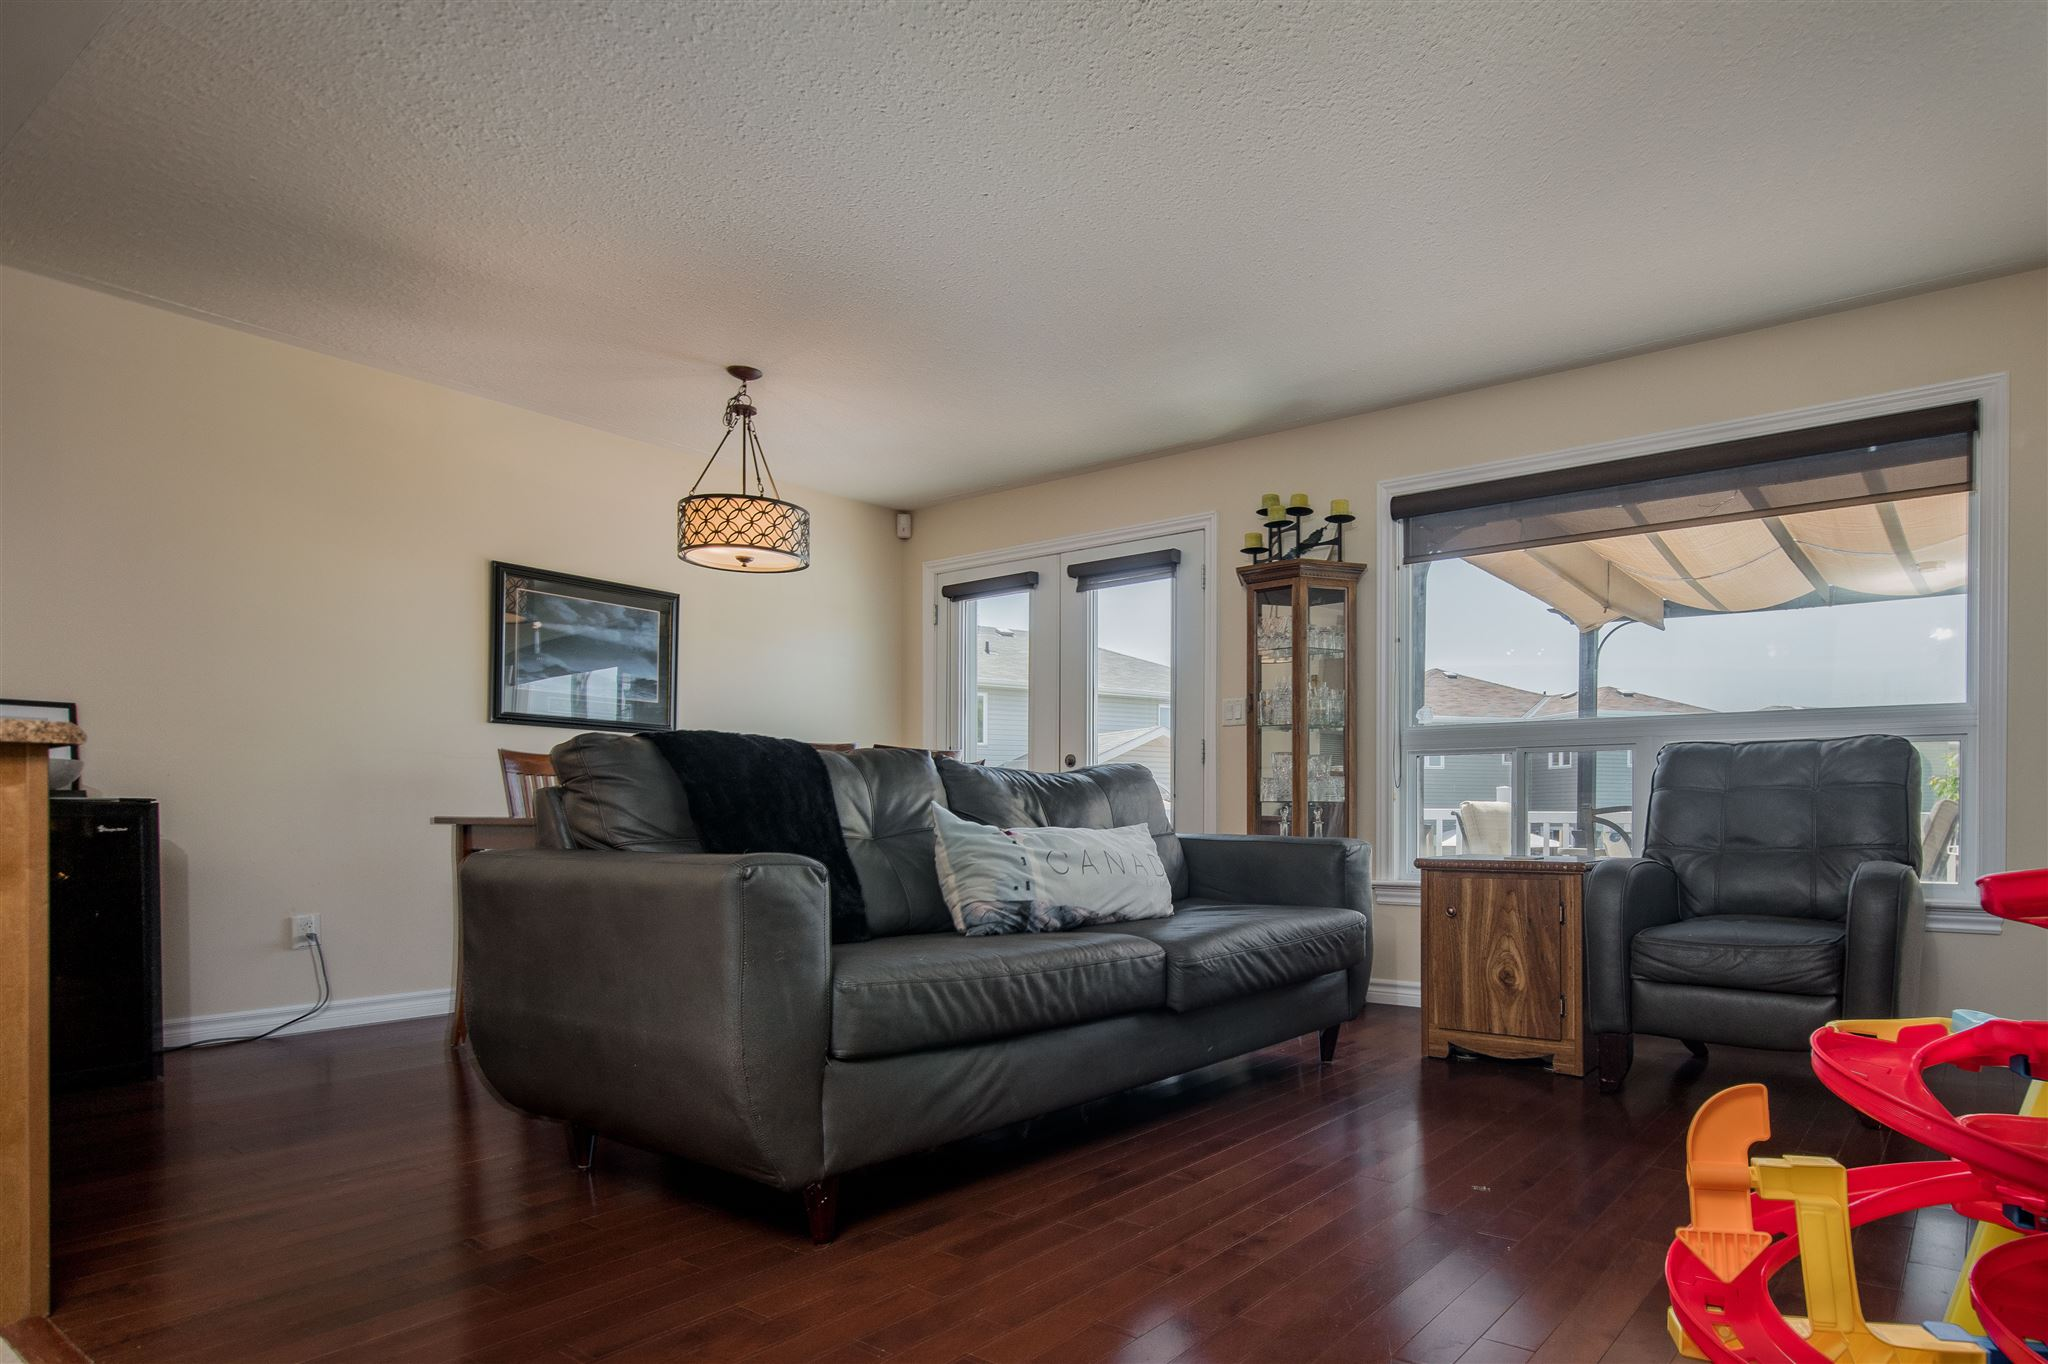 180 Kildare Avenue, Amherstview, Ontario (ID K20003232)